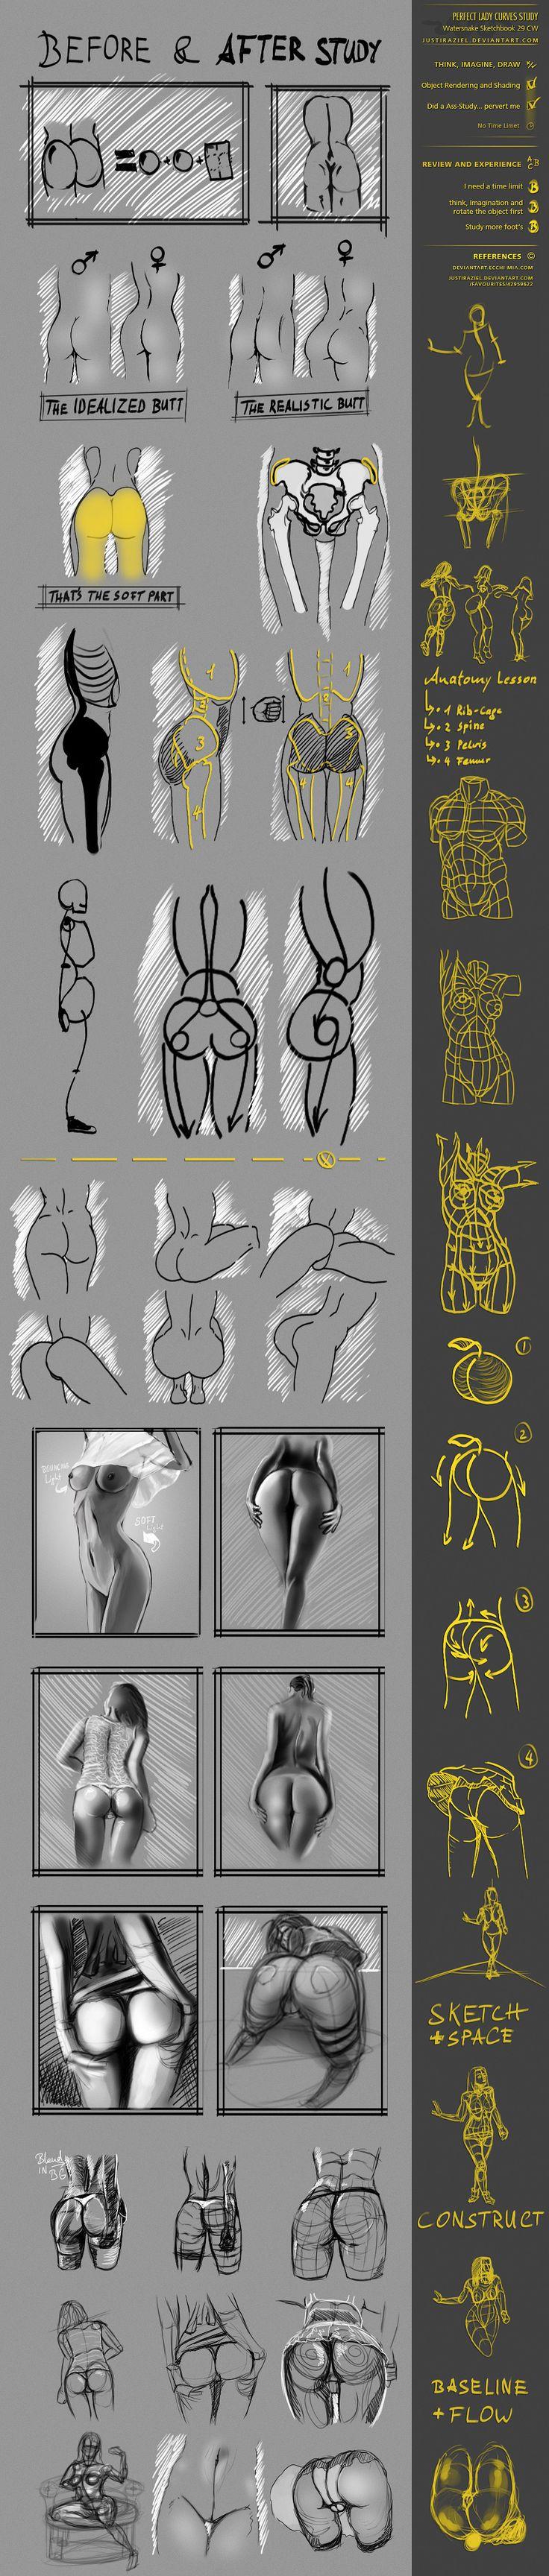 CW 29 Perfect Lady Curves Study by JustIRaziel.deviantart.com on @DeviantArt